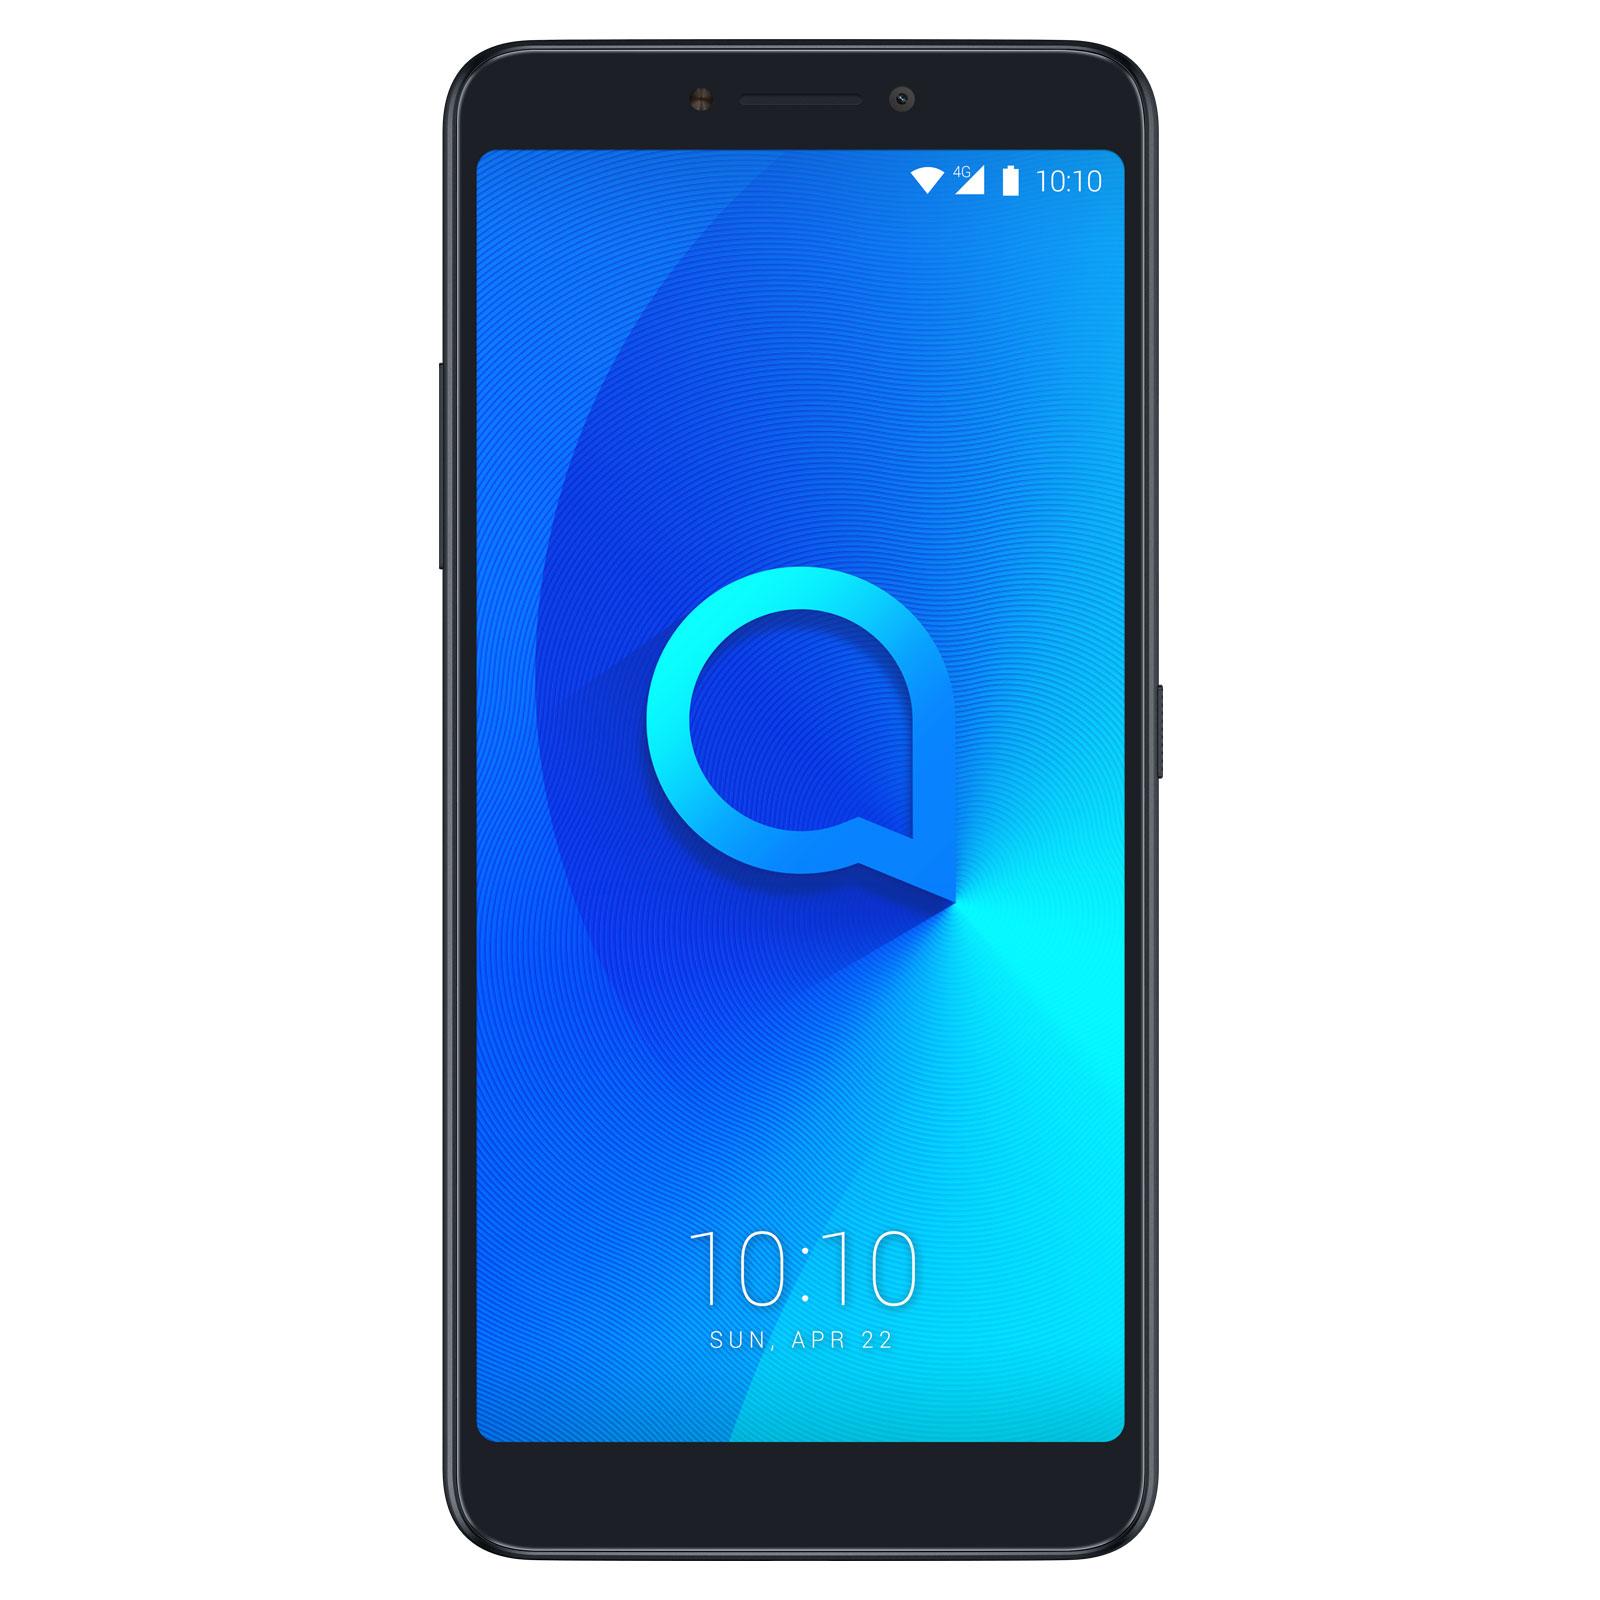 "Mobile & smartphone Alcatel 3v Noir Smartphone 4G-LTE Dual SIM - MediaTek MT8735A Quad-Core 1.4 GHz - RAM 2 Go - Ecran tactile 6"" 1080 x 2160 - 16 Go - Bluetooth 4.2 - 3000 mAh - Android 8.0"